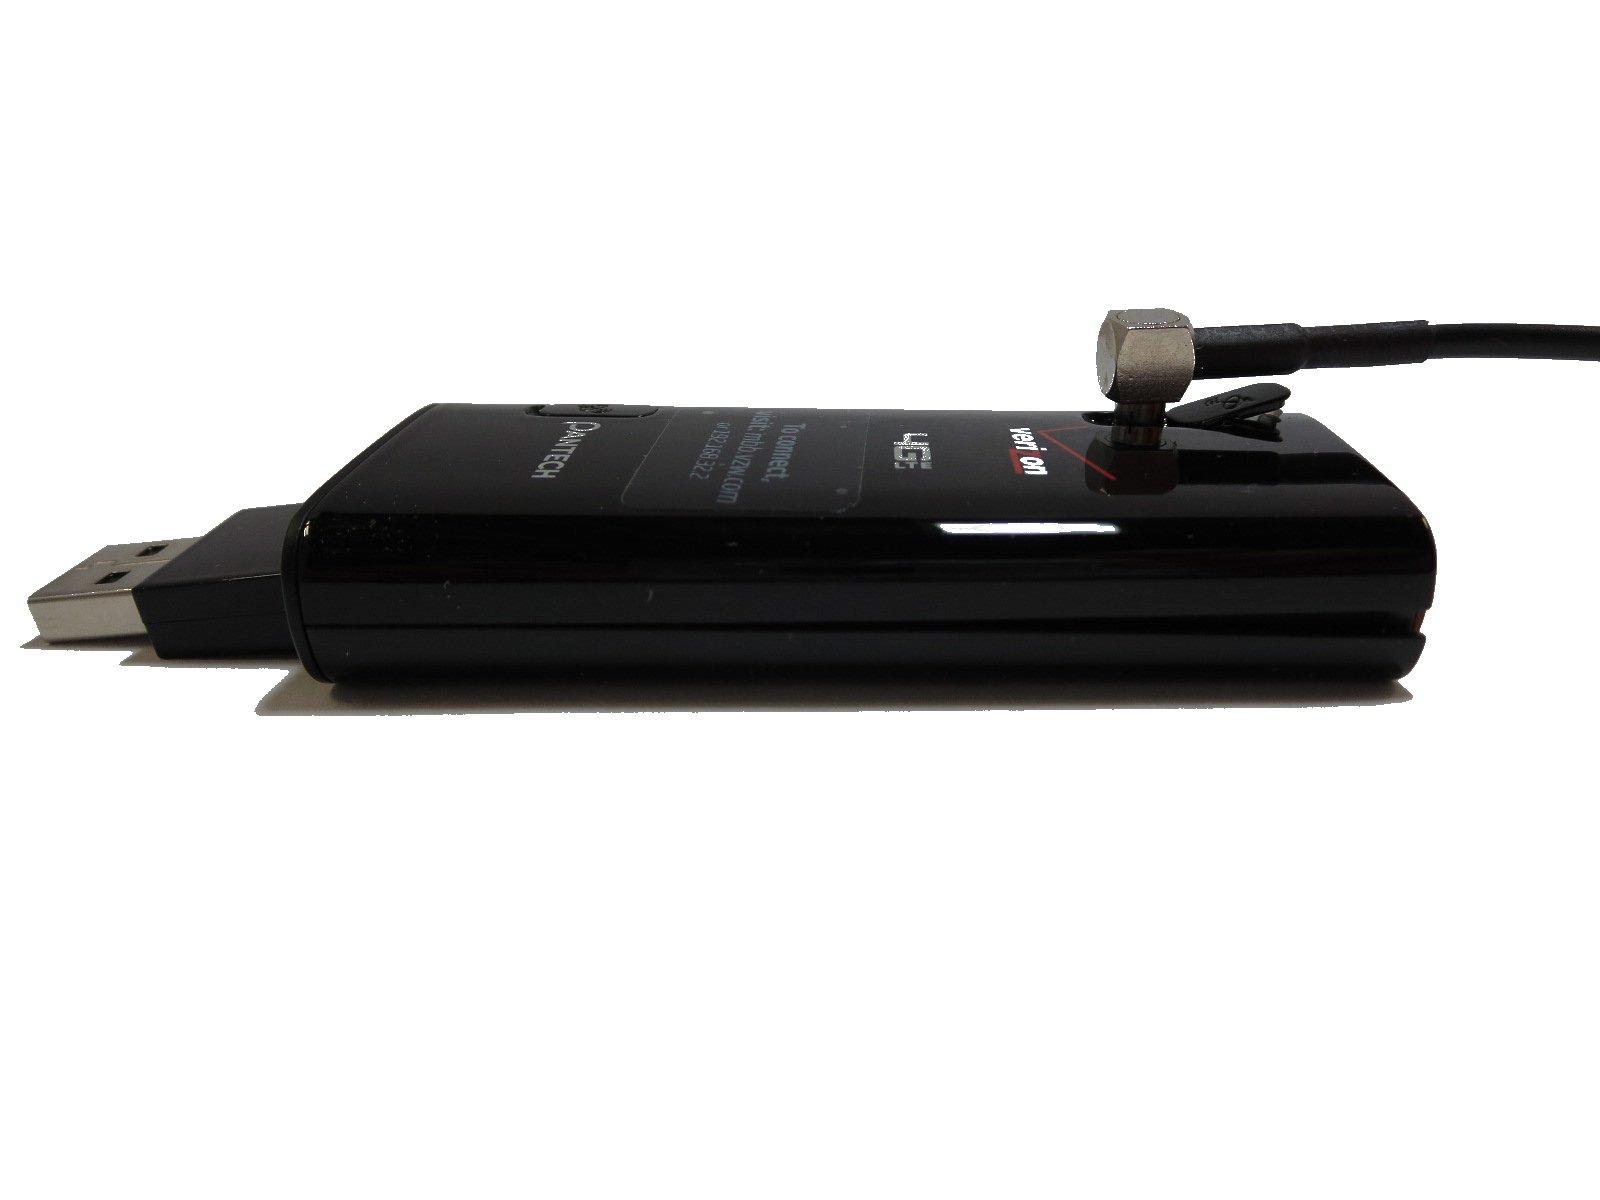 8 dBi Verizon / Pantech UML290 & UML295 USB Modem External High Gain Magnetic Antenna (3G / 4G / LTE / xLTE) by Proxicast (Image #7)